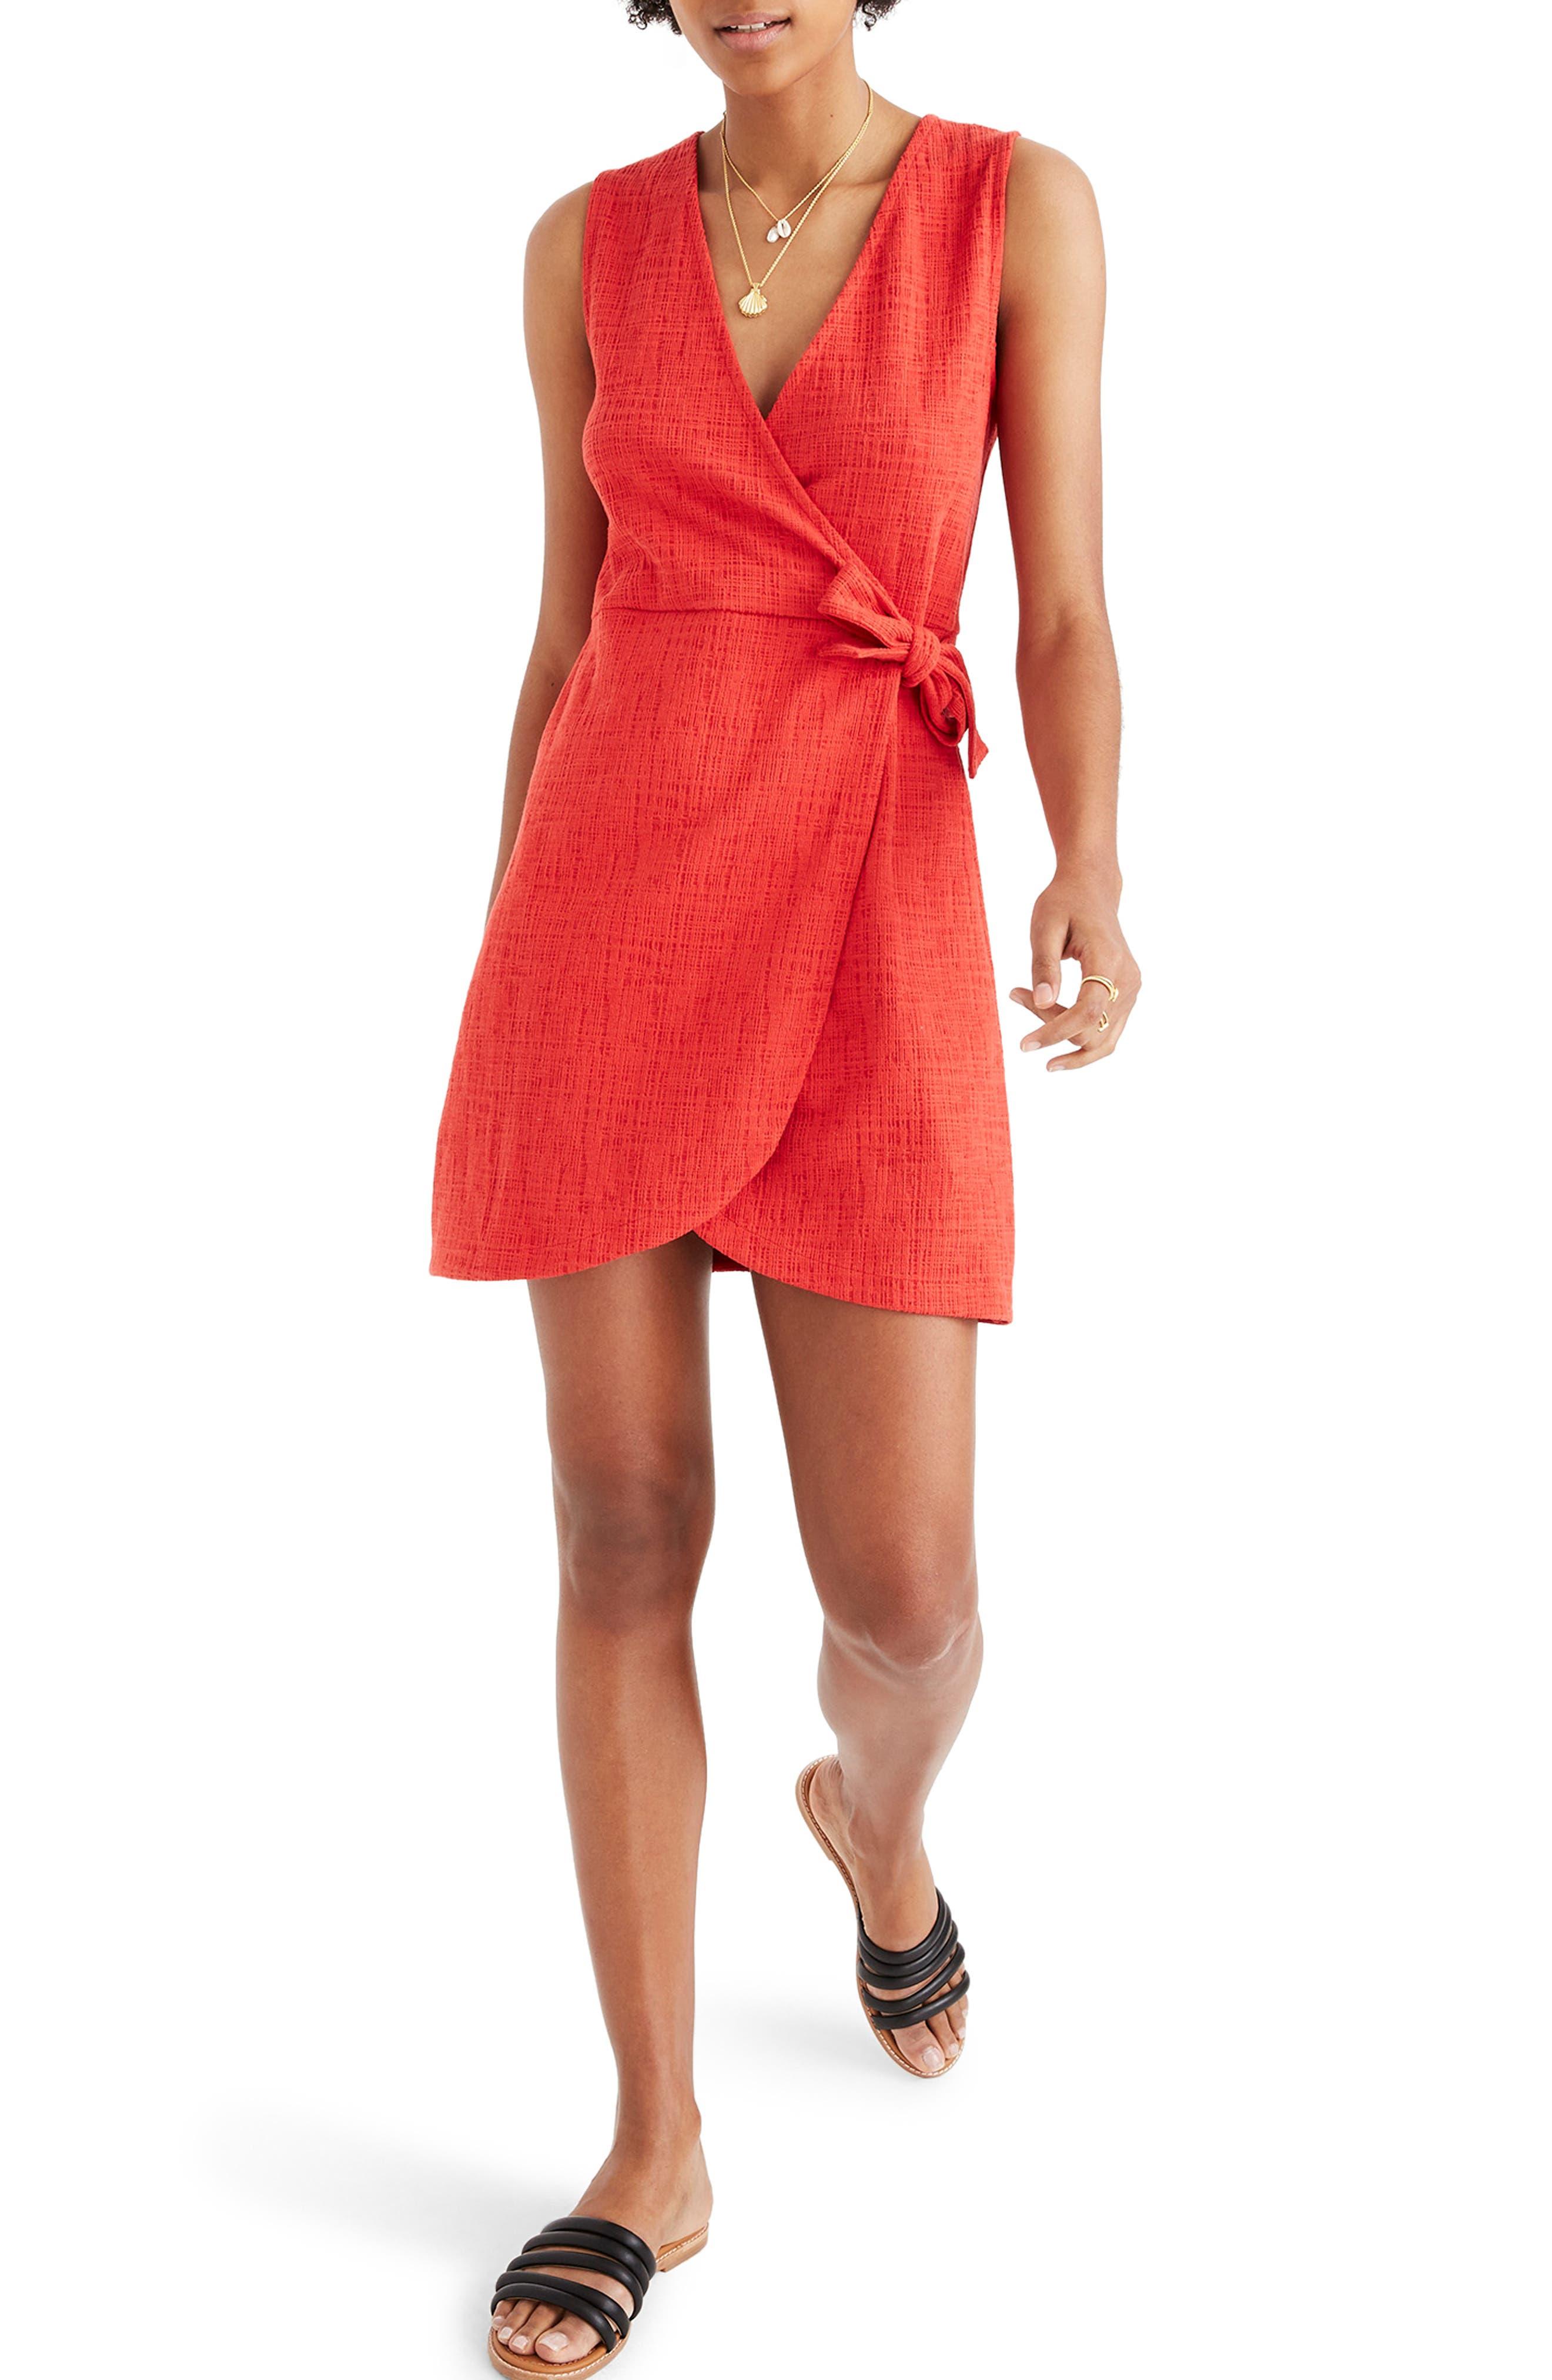 Madewell Texture & Thread Side Tie Minidress, Red